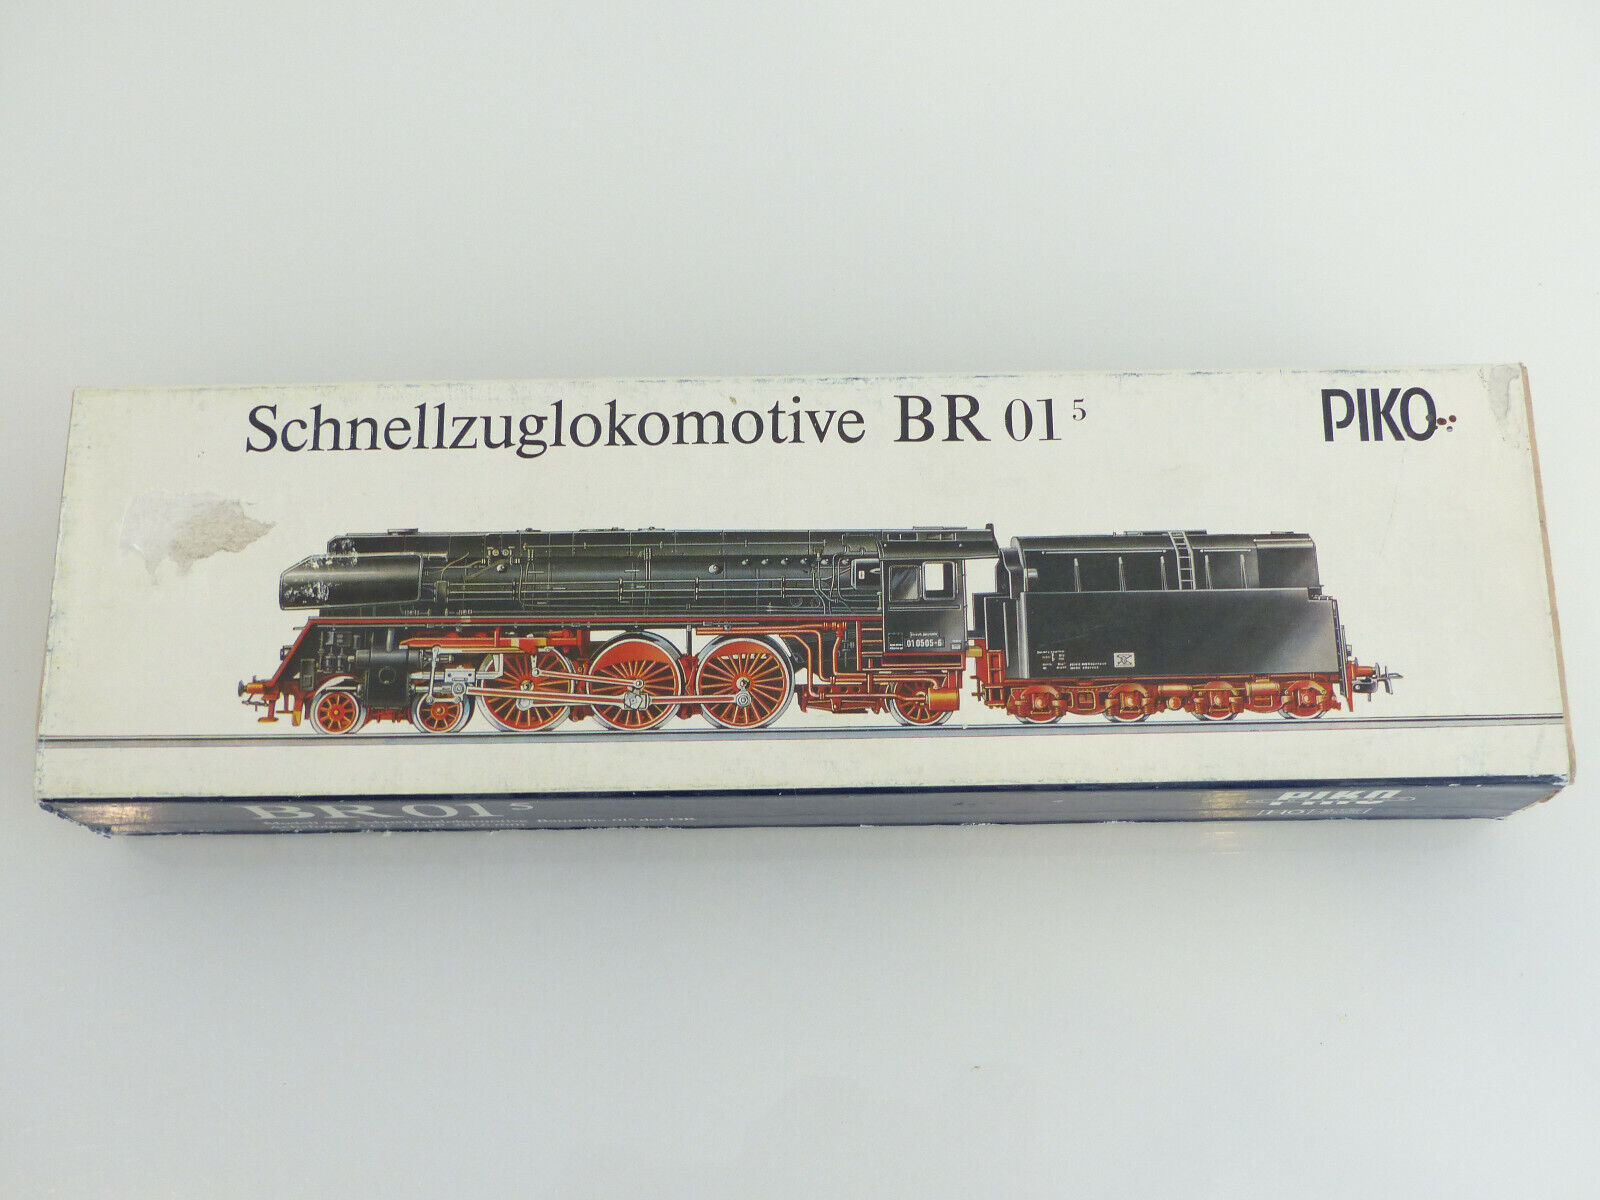 Piko br 01 5 Lok h0 m 1 87 16,5mm tren bala locomotora coleccionista Top